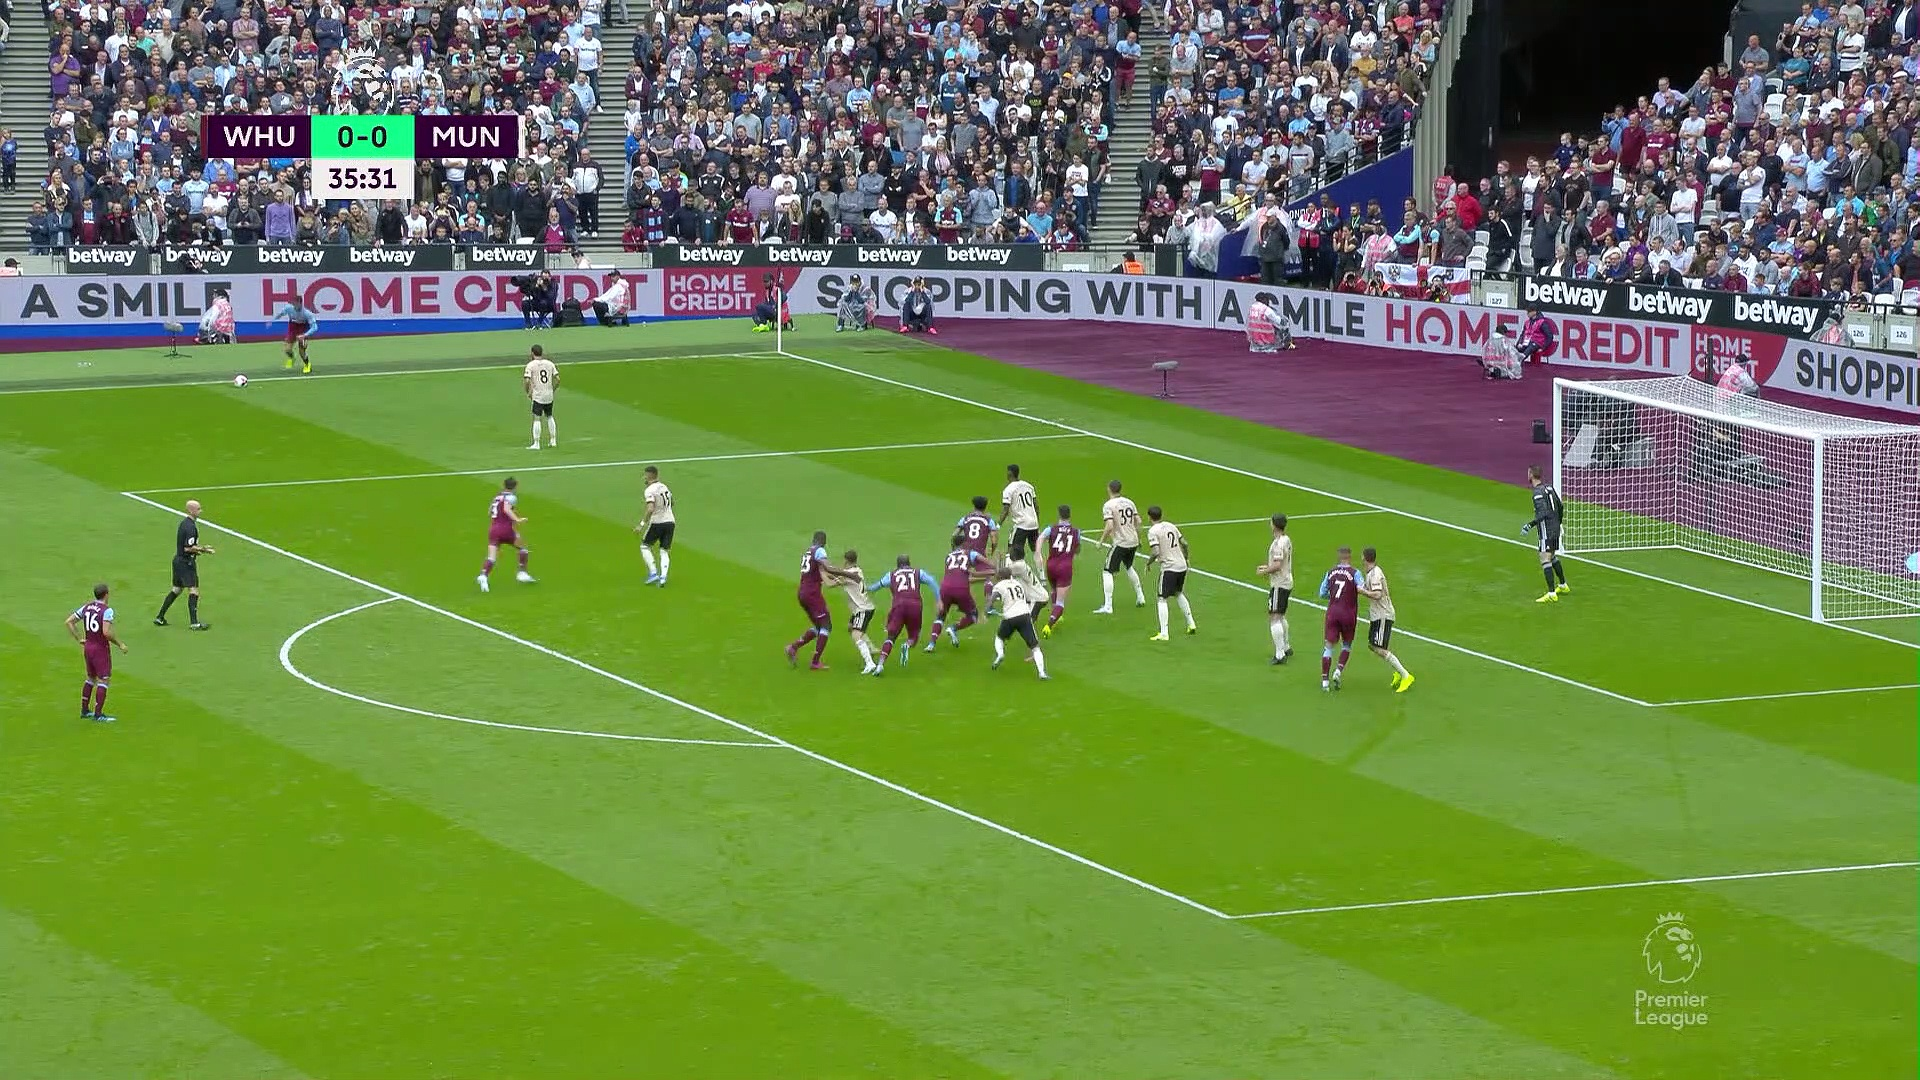 6. Hafta / West Ham United - Manchester United 2-0 (Özet)